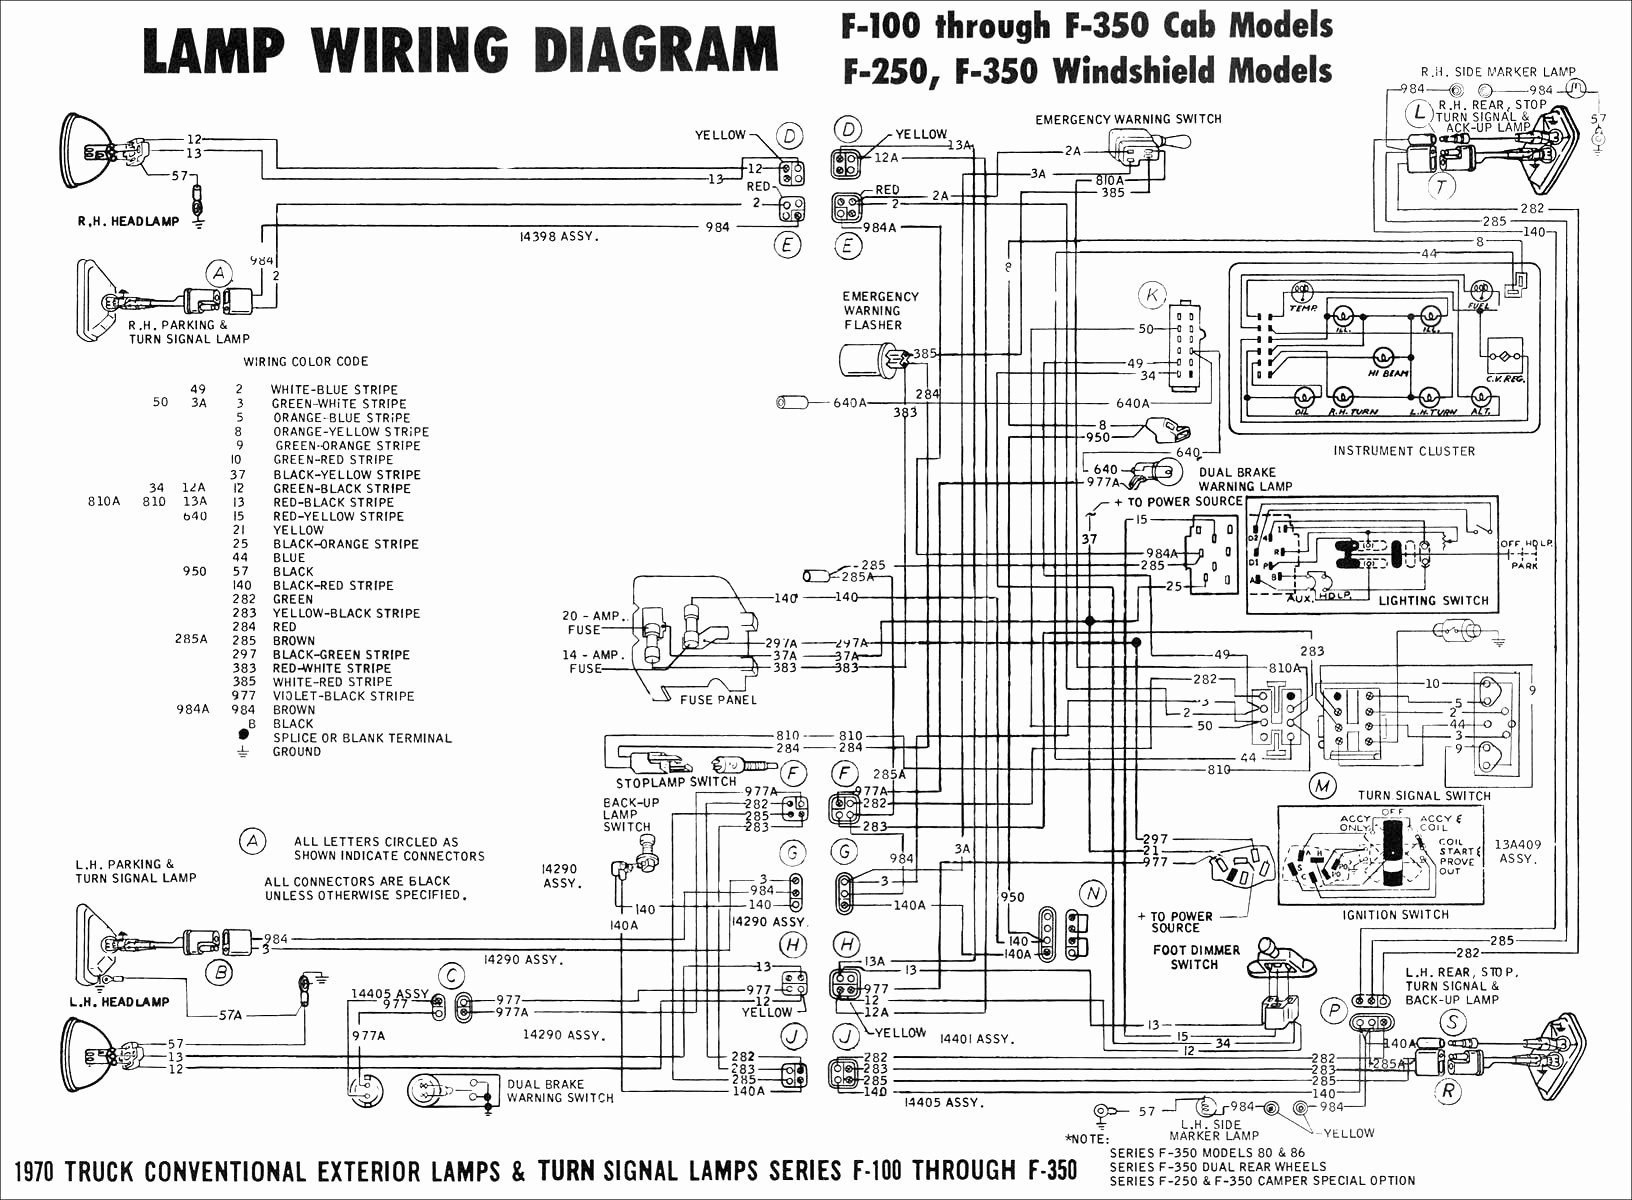 1996 ford Explorer Parts Diagram 1994 Aerostar Charging Circuit Schematic Diagram ford Explorer and Of 1996 ford Explorer Parts Diagram